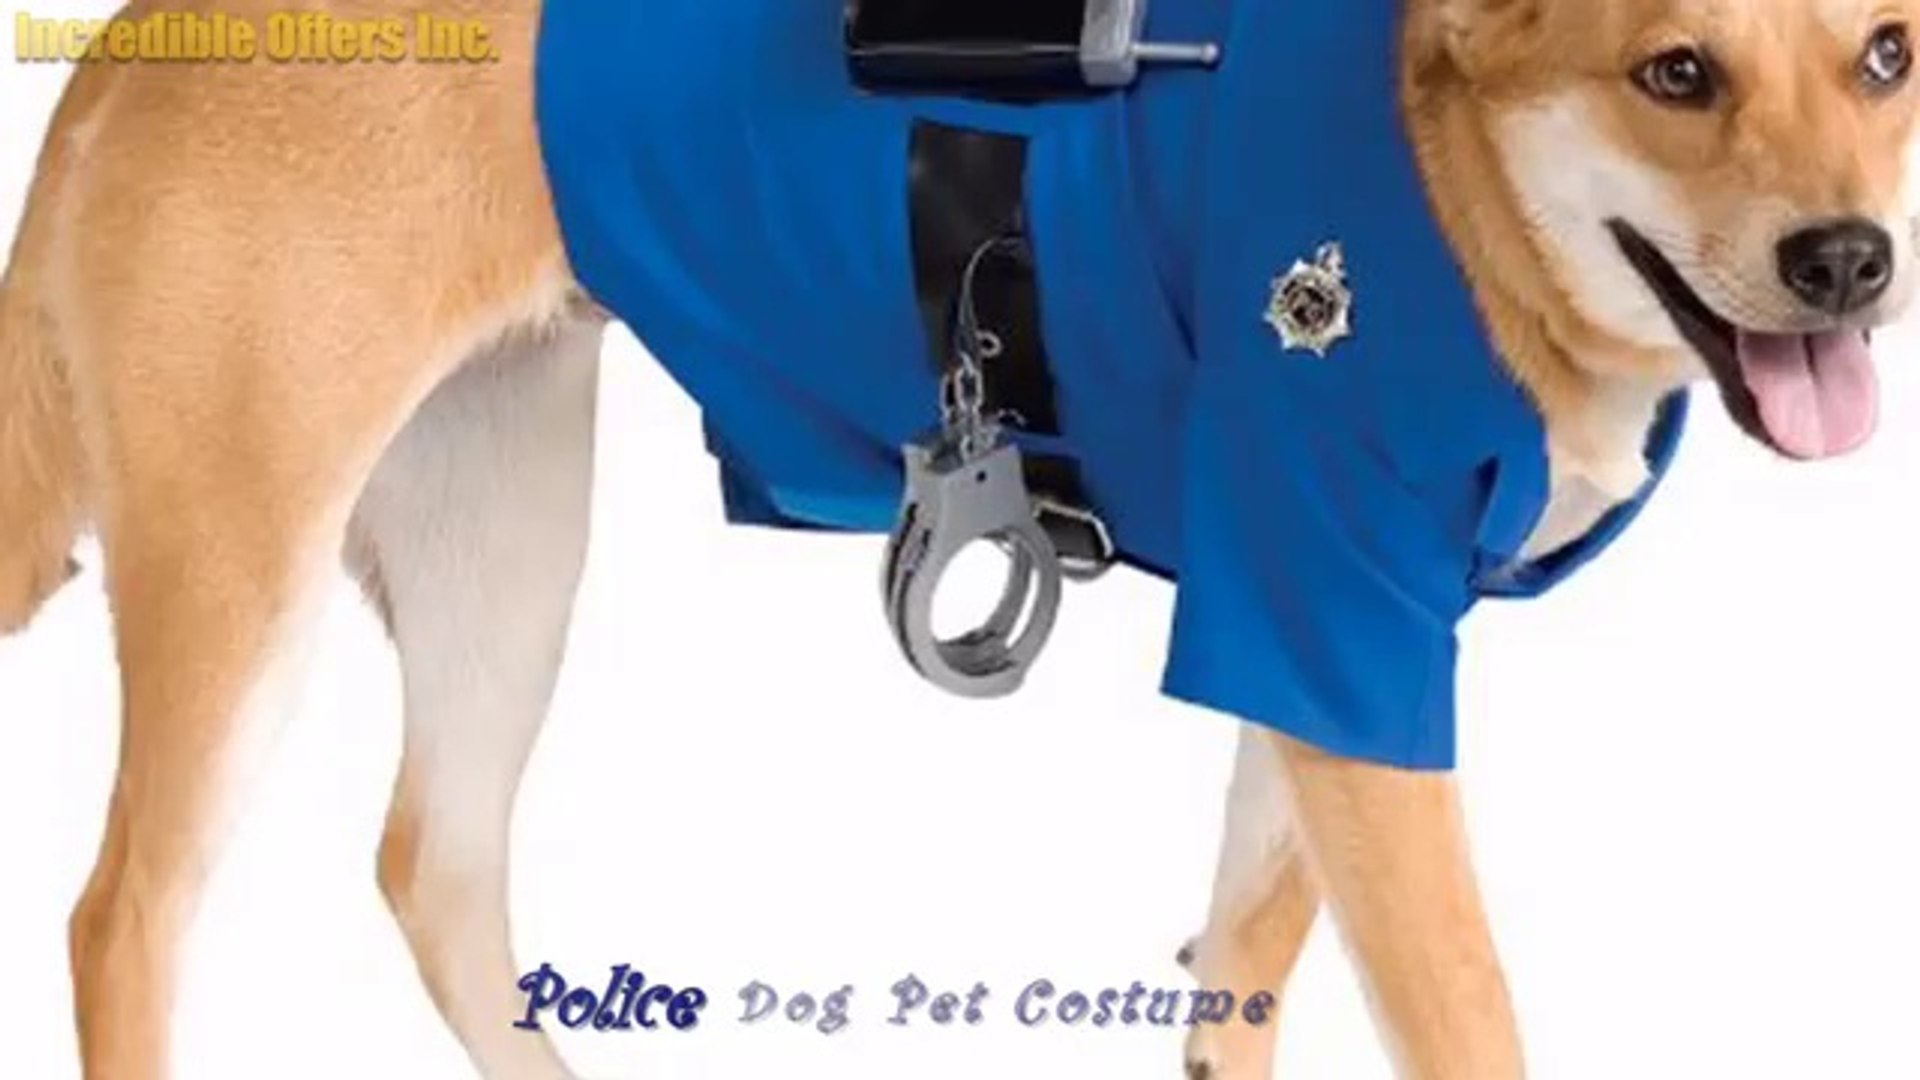 Pets Halloween - Best-Selling Pet Costumes